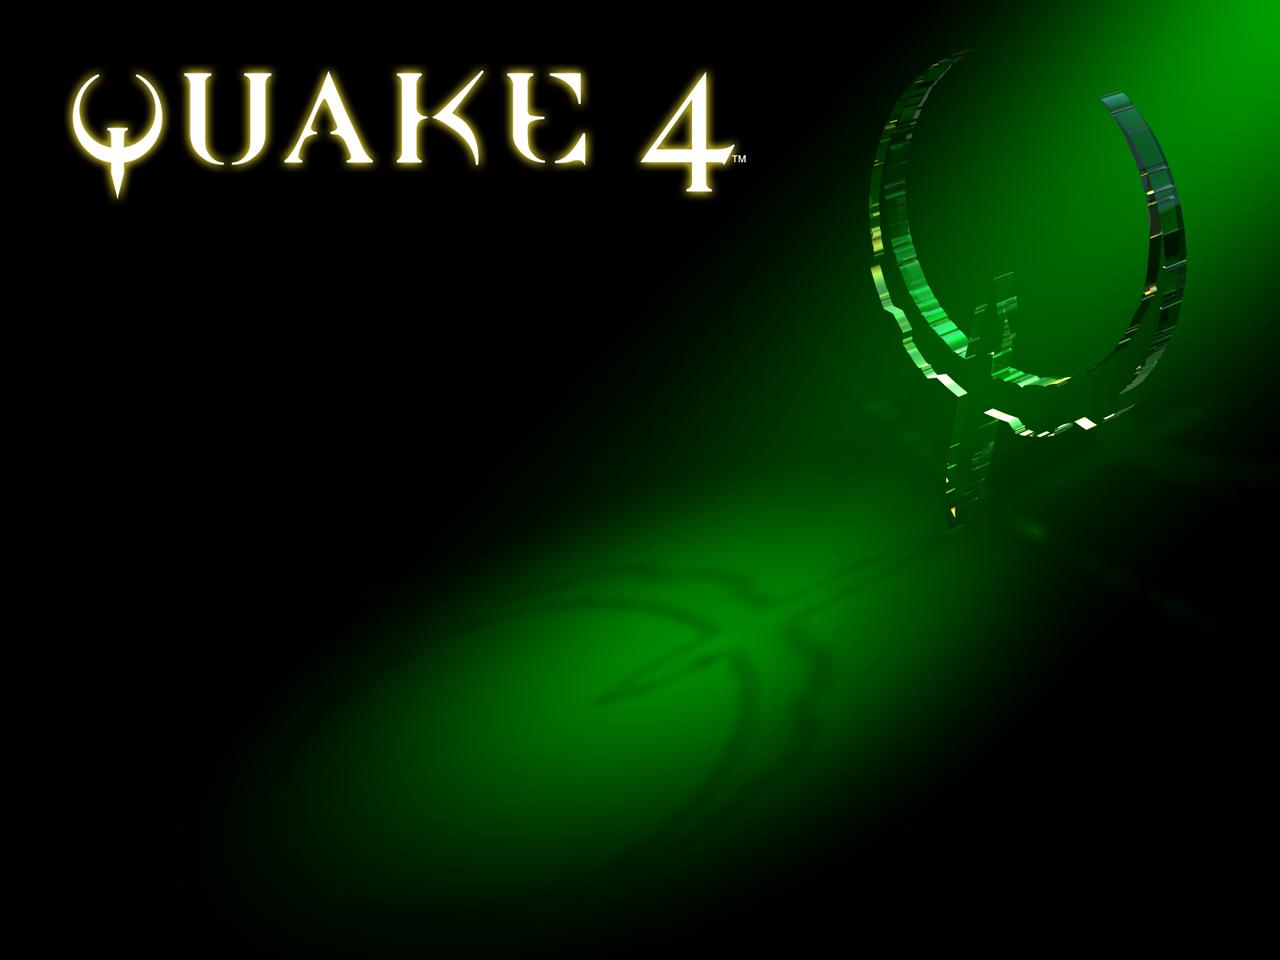 Quake 4 Wallpaper by MC Gun 1280x960